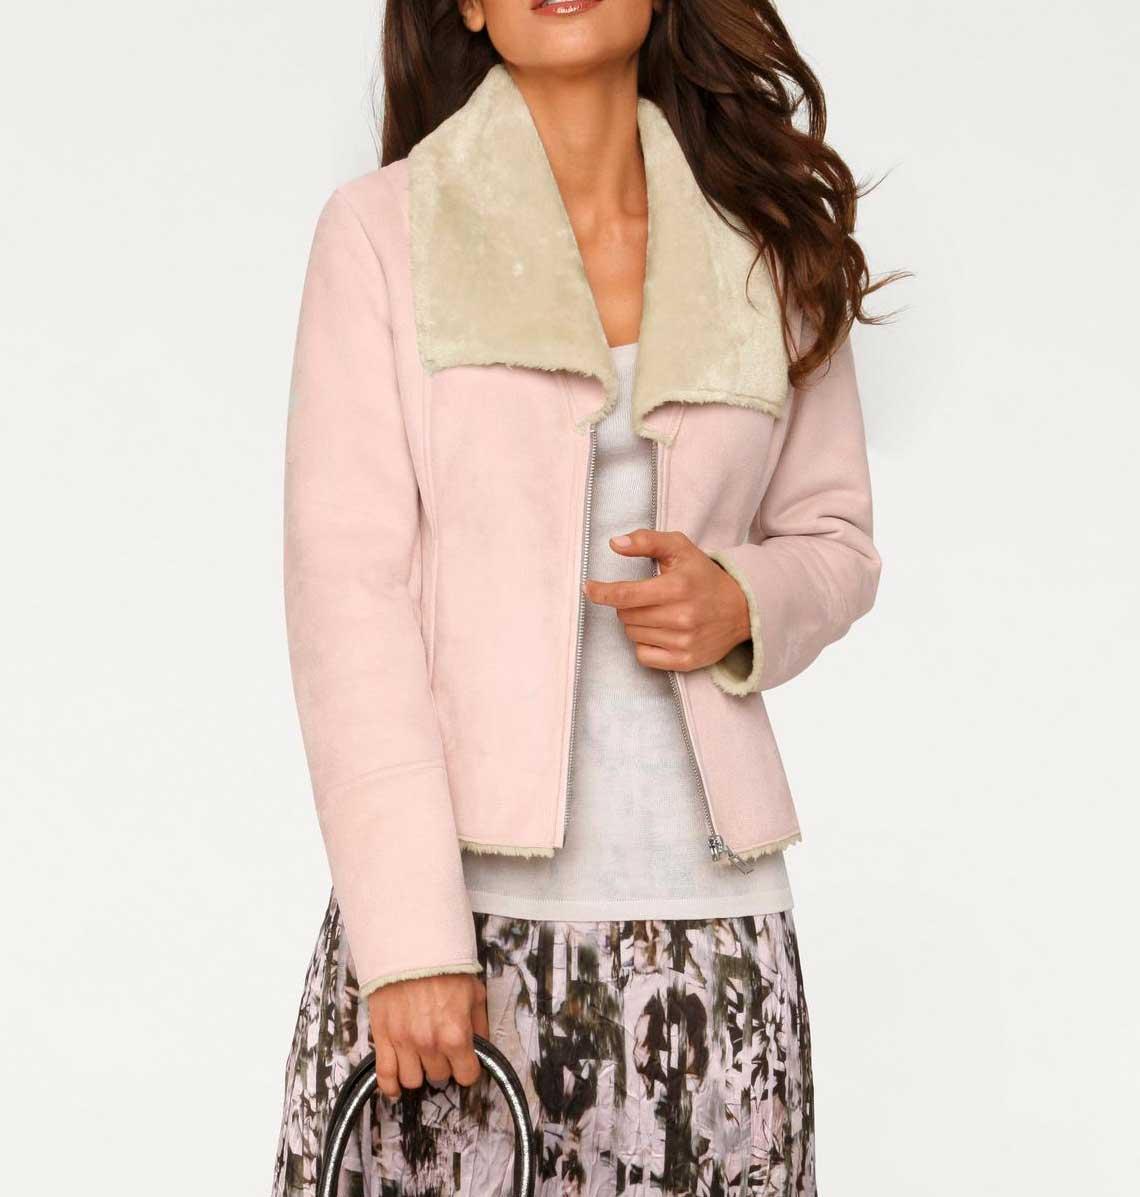 jacken auf rechnung bestellen als neukunde ASHLEY BROOKE Damen Designer-Jacke Lammfell Look Lederimitat Webpelz Rosa-Creme 179.820 MISSFORTY